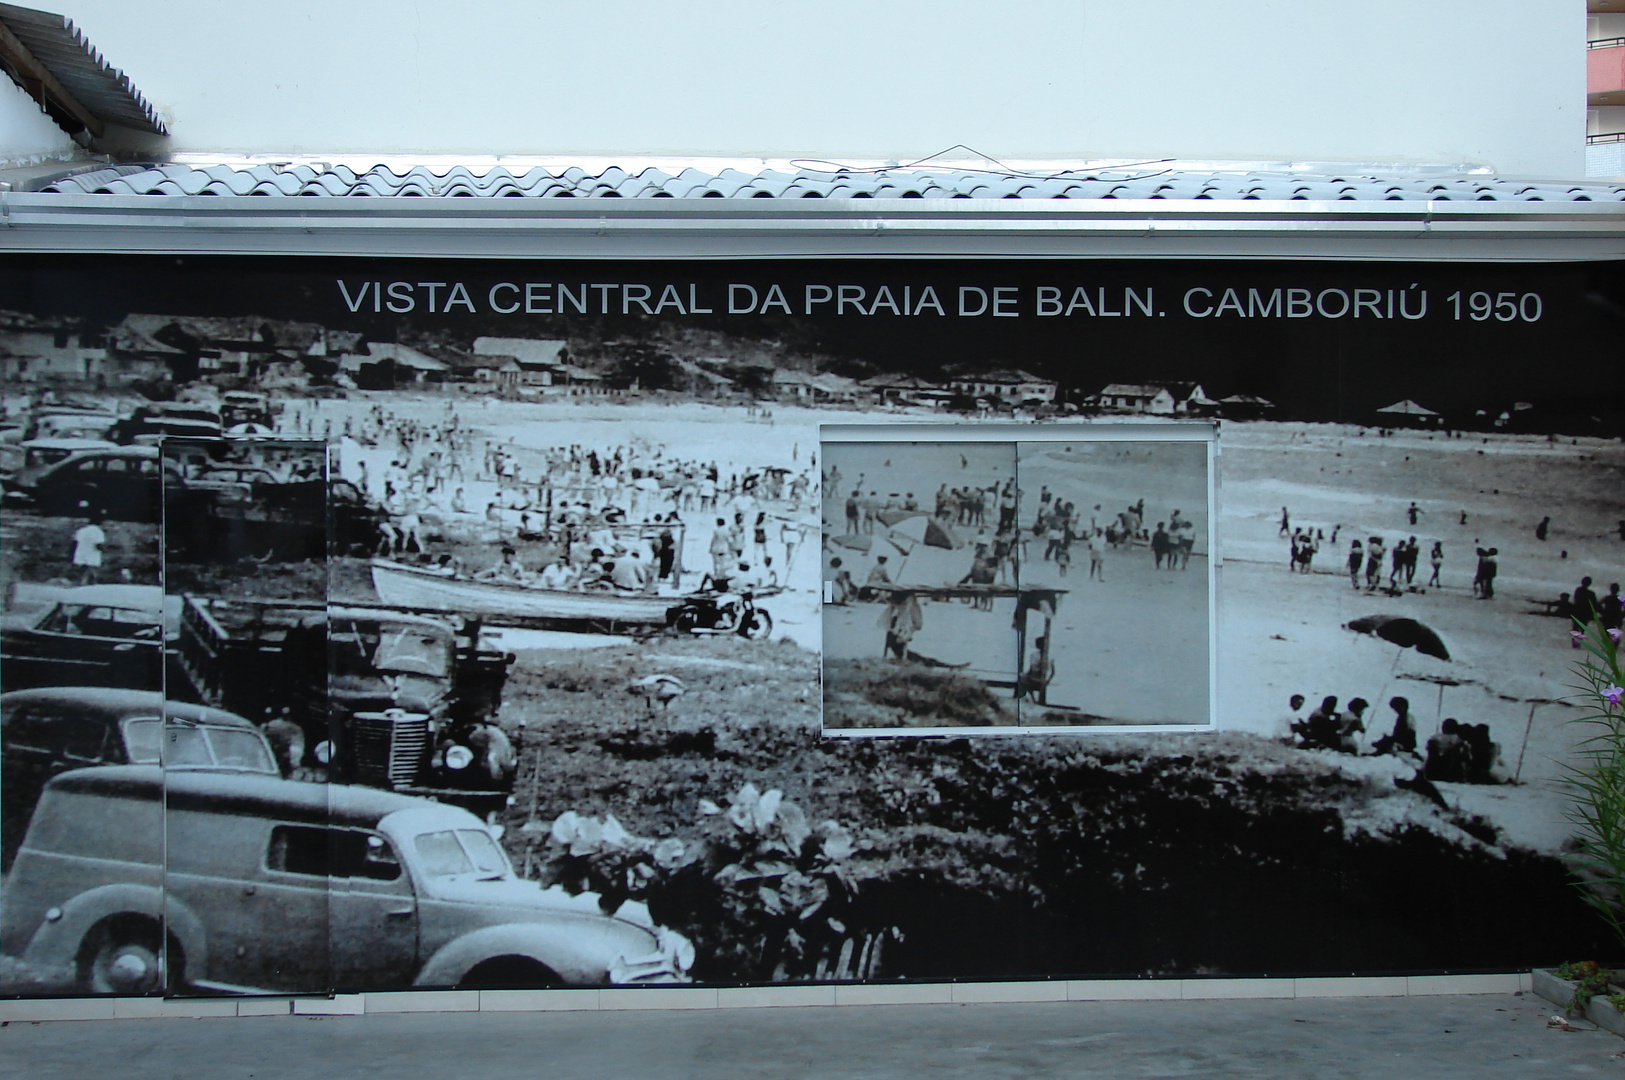 CAMBORIU 1950 -  BRASIL